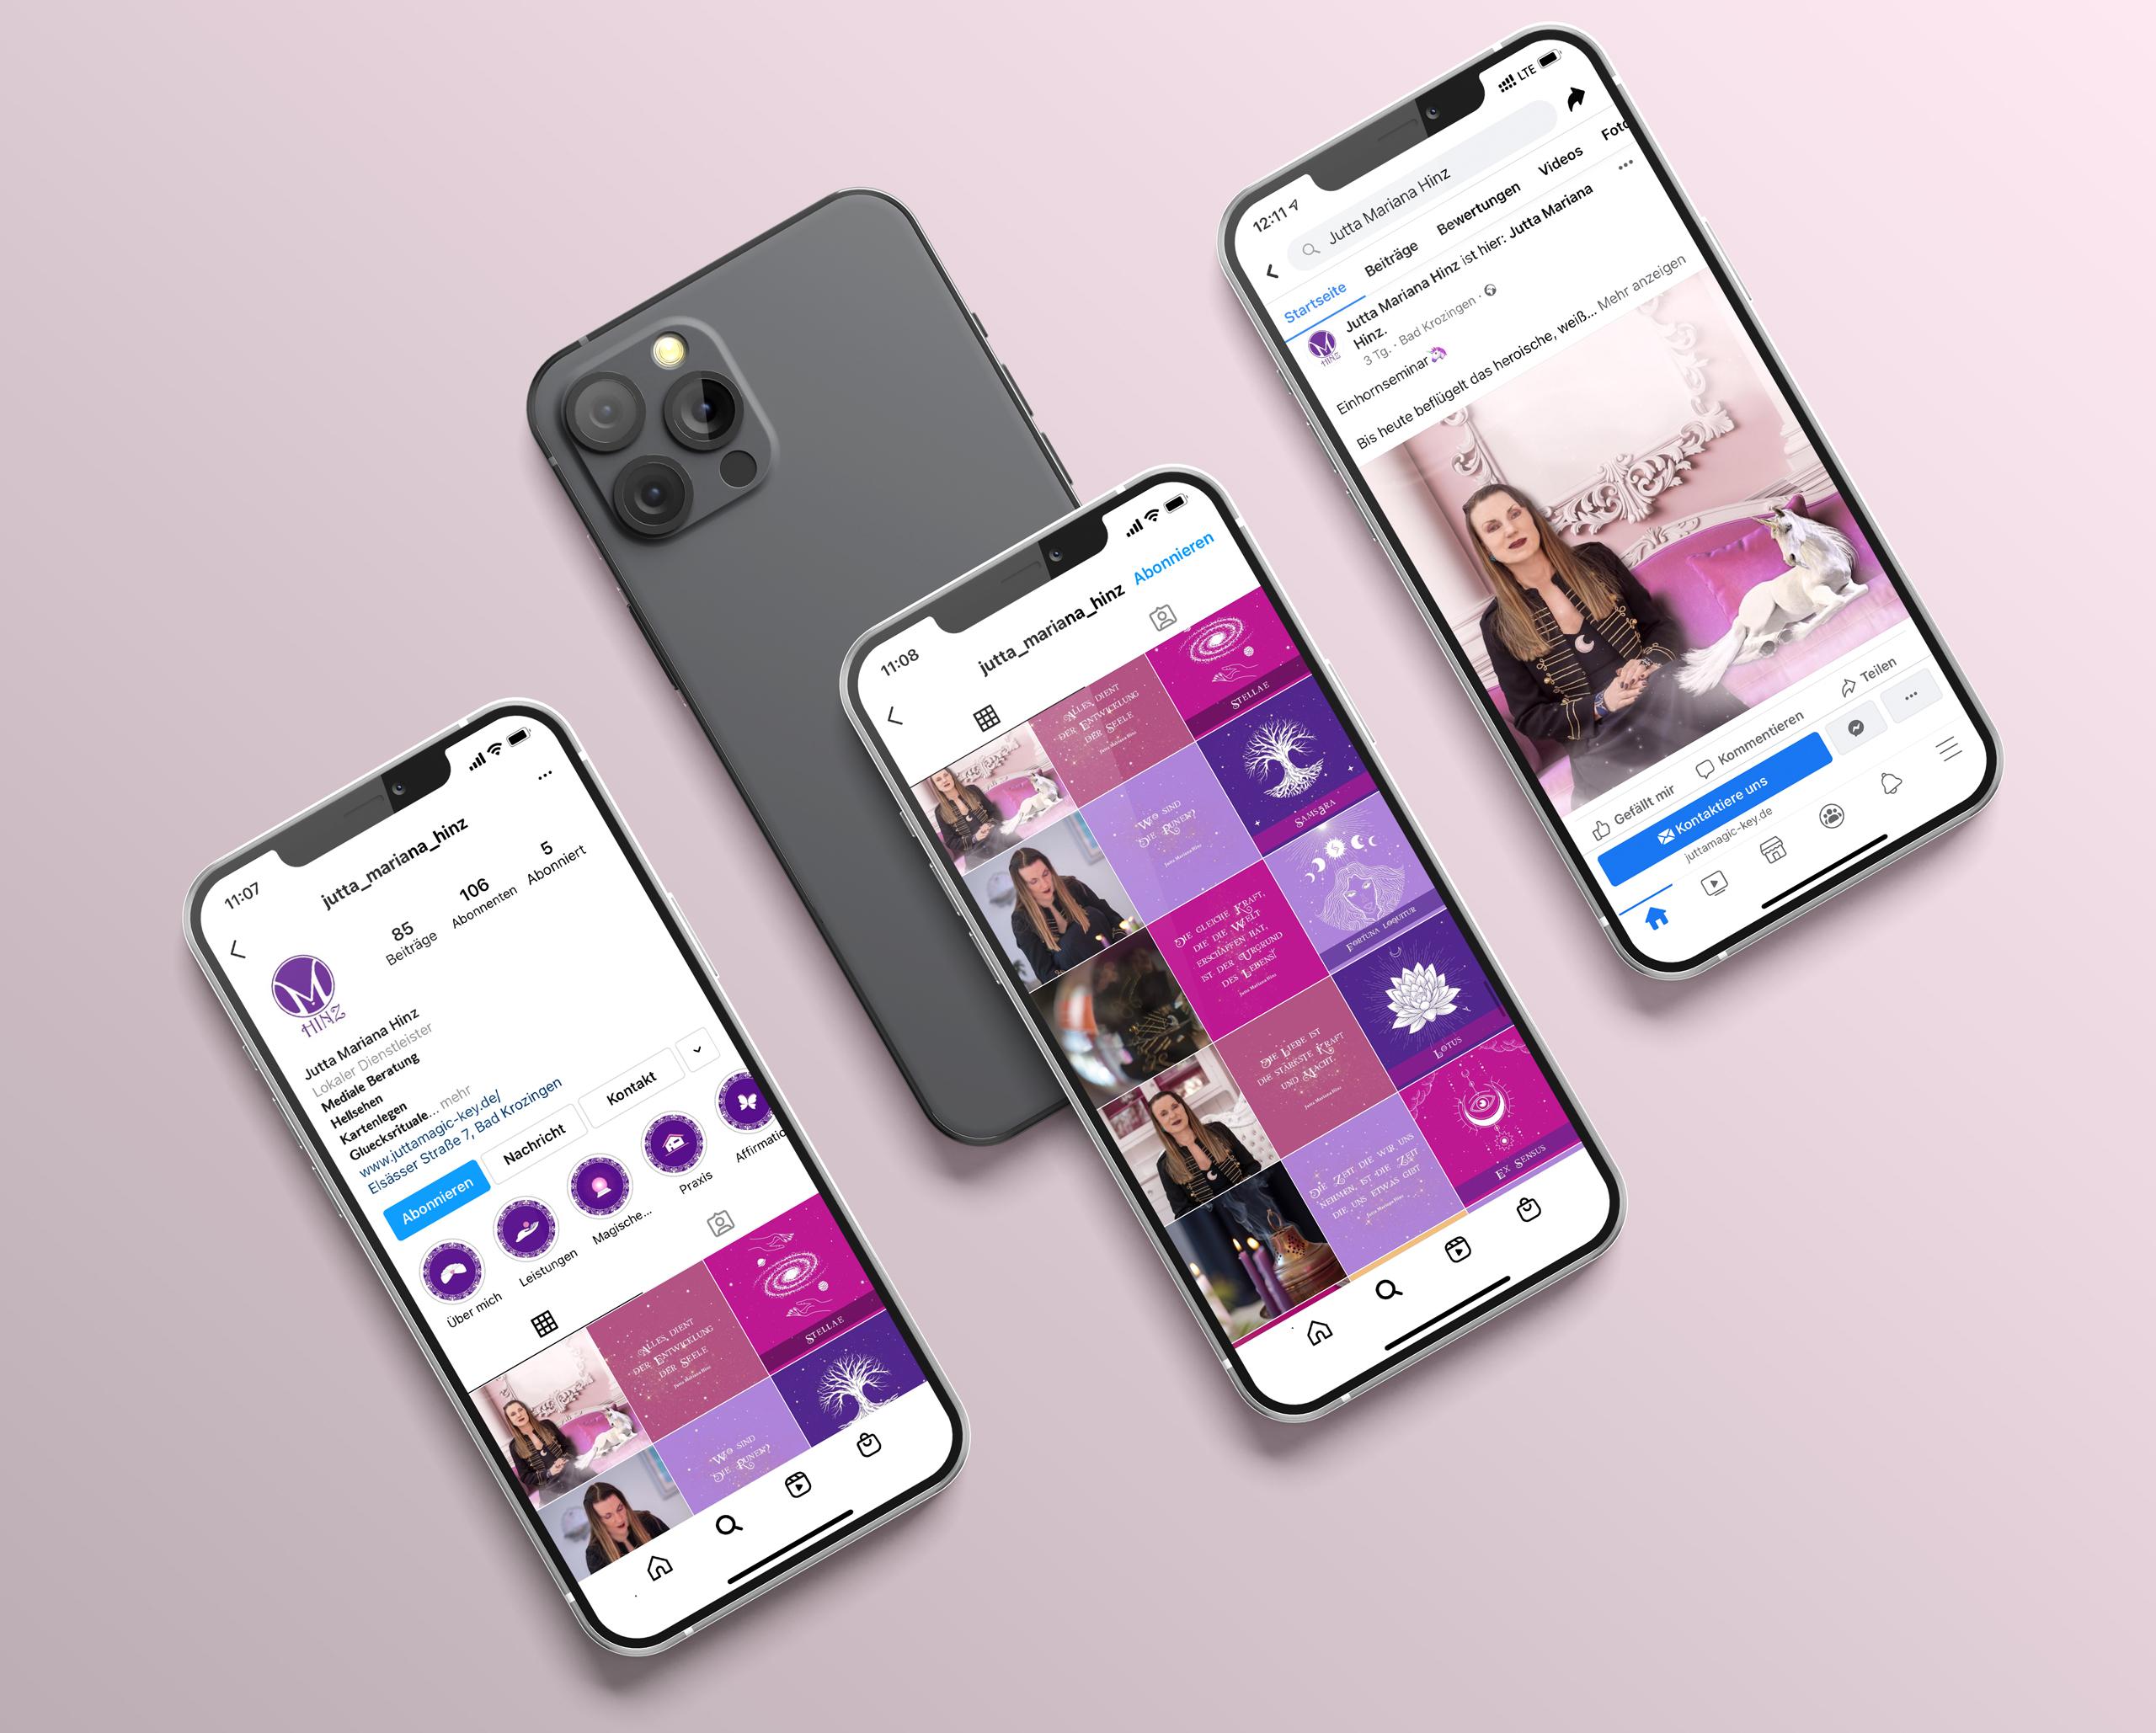 I Phone Mockup Hinz 2021 BG   MedienMacher